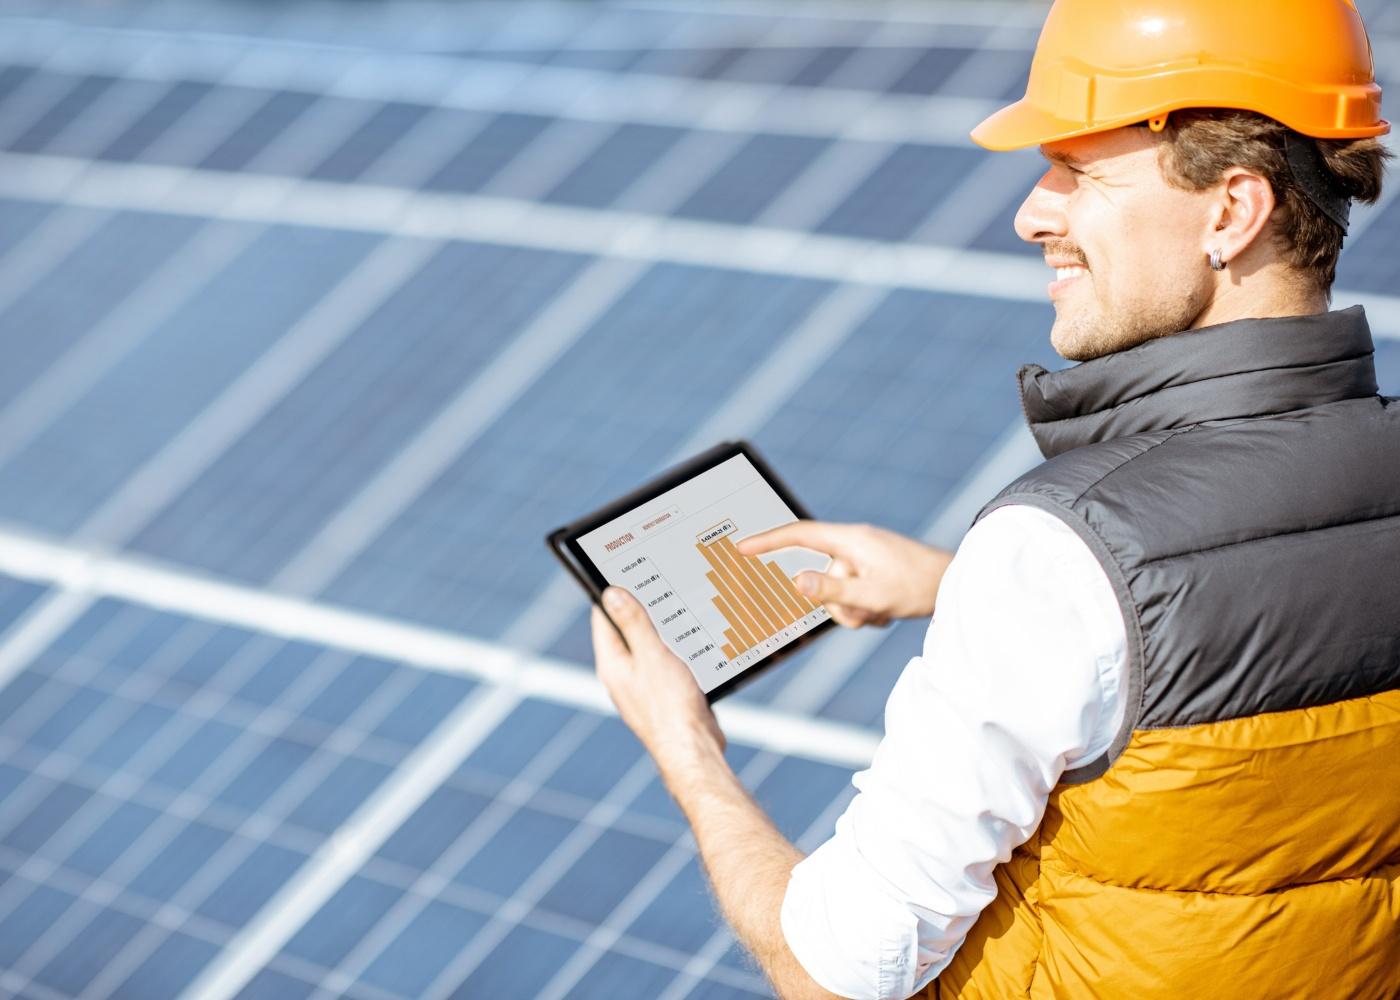 colocar painel fotovoltaico